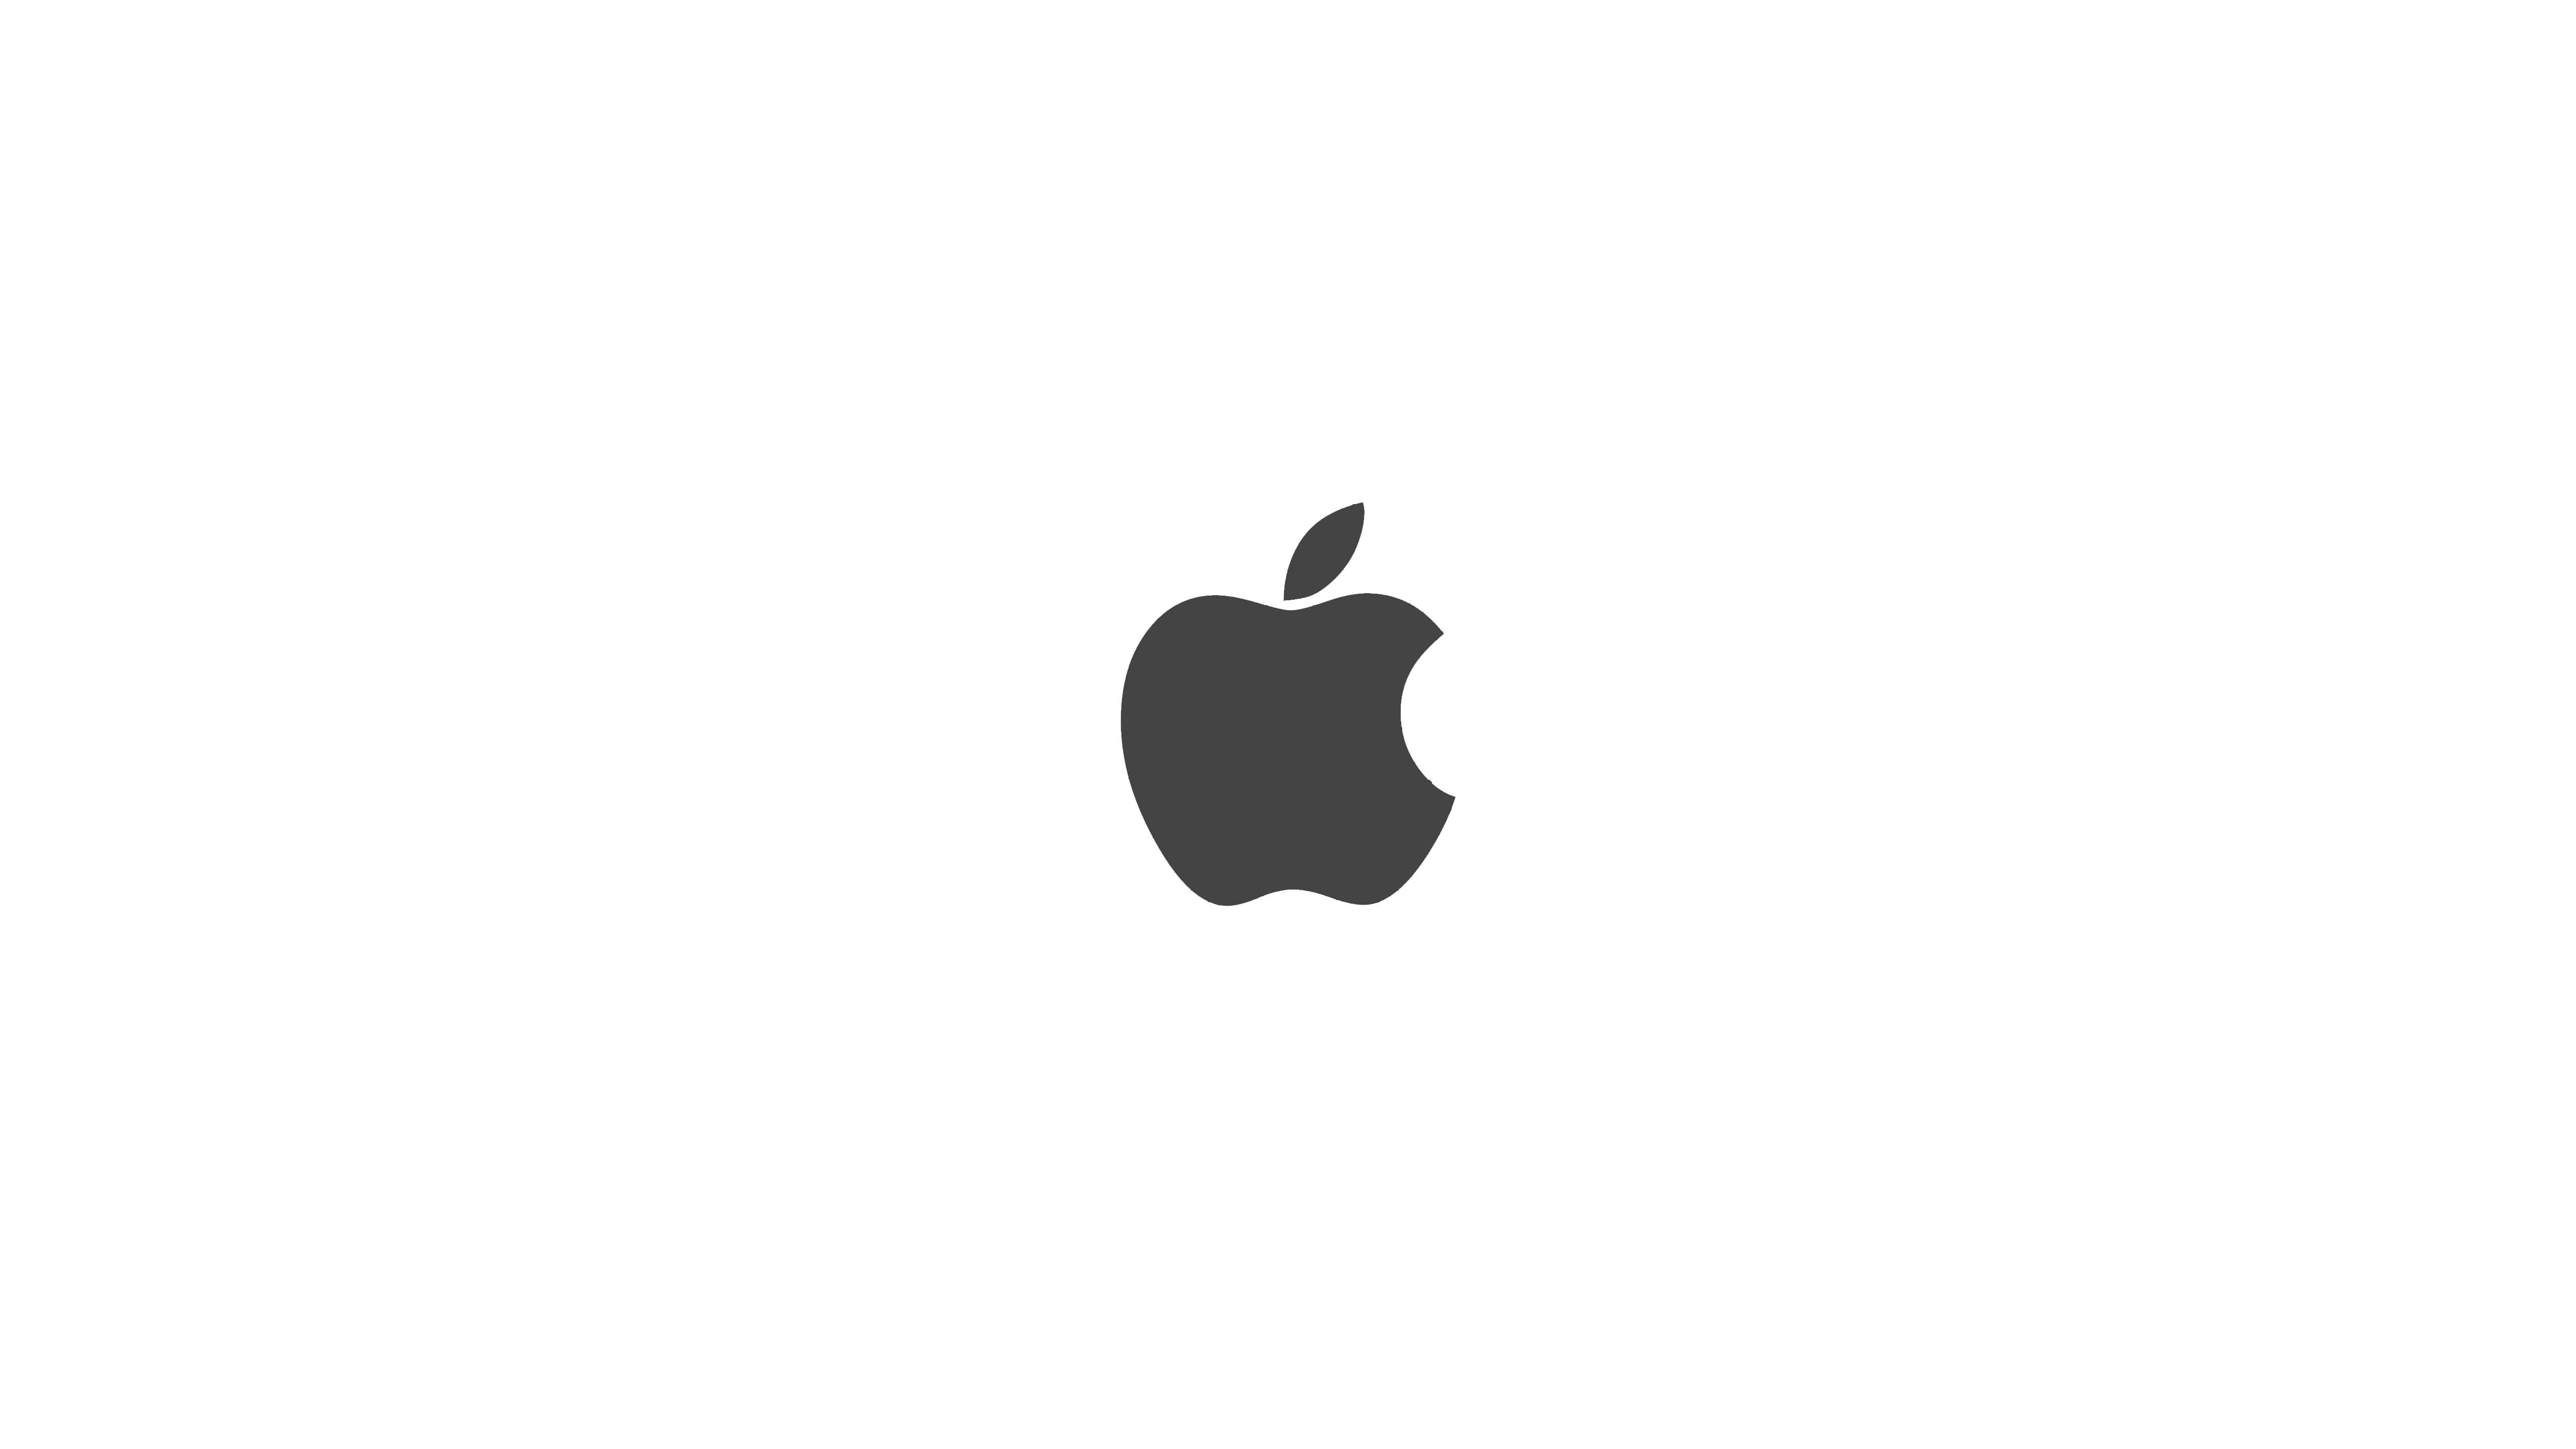 Apple(アップル) 最新情報